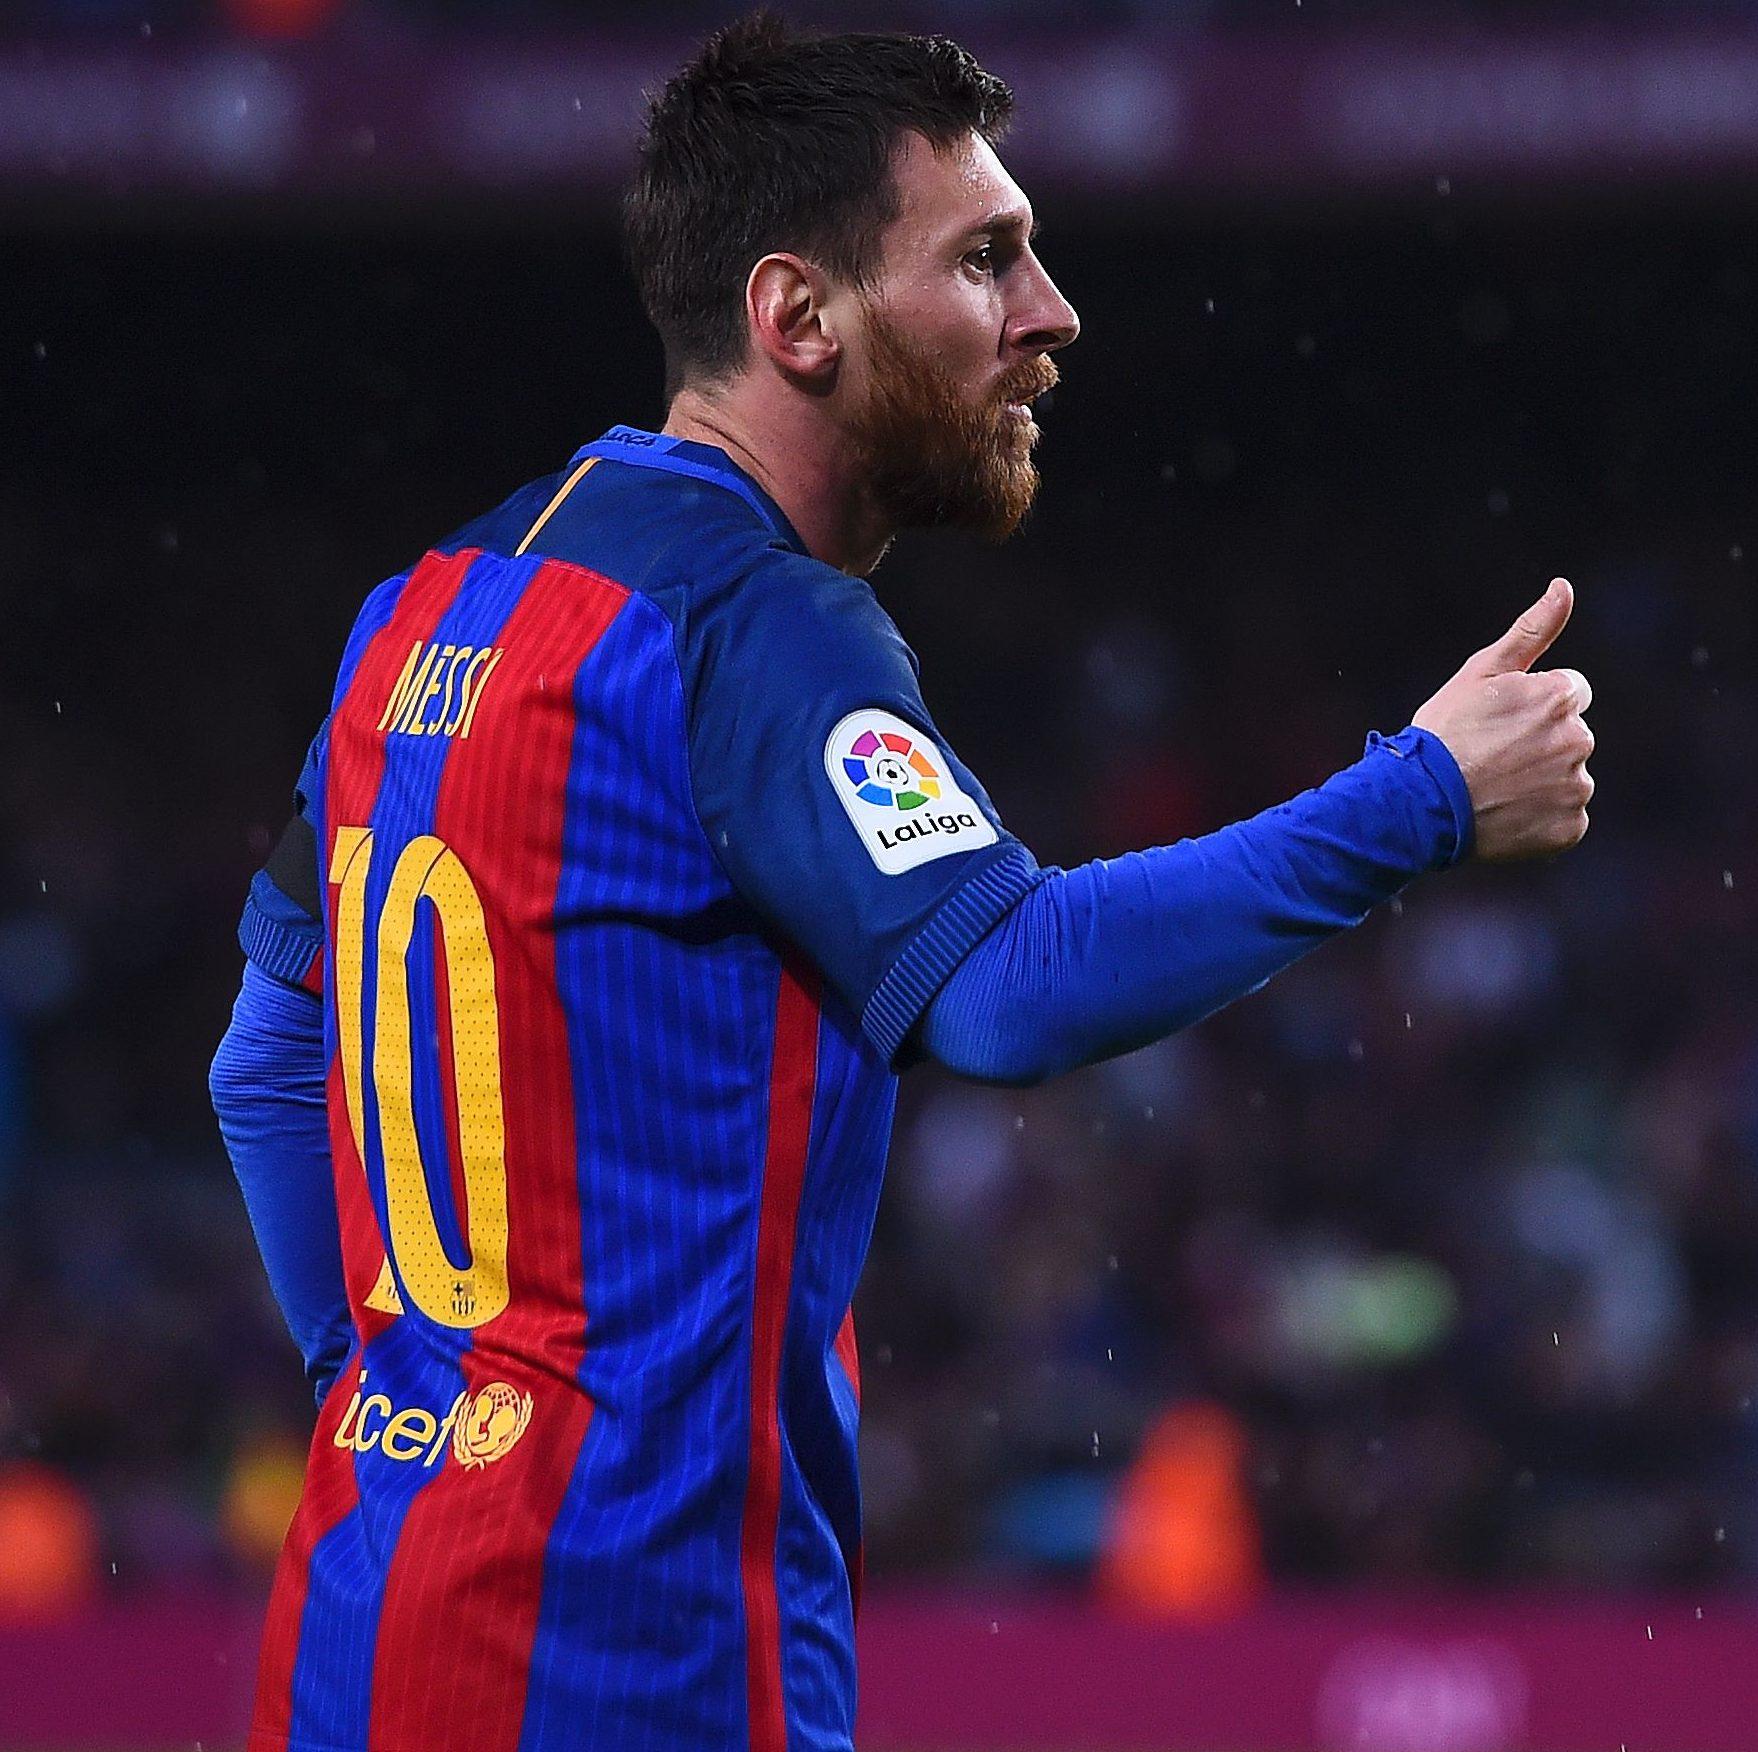 Leo Messi - Sphera Sports